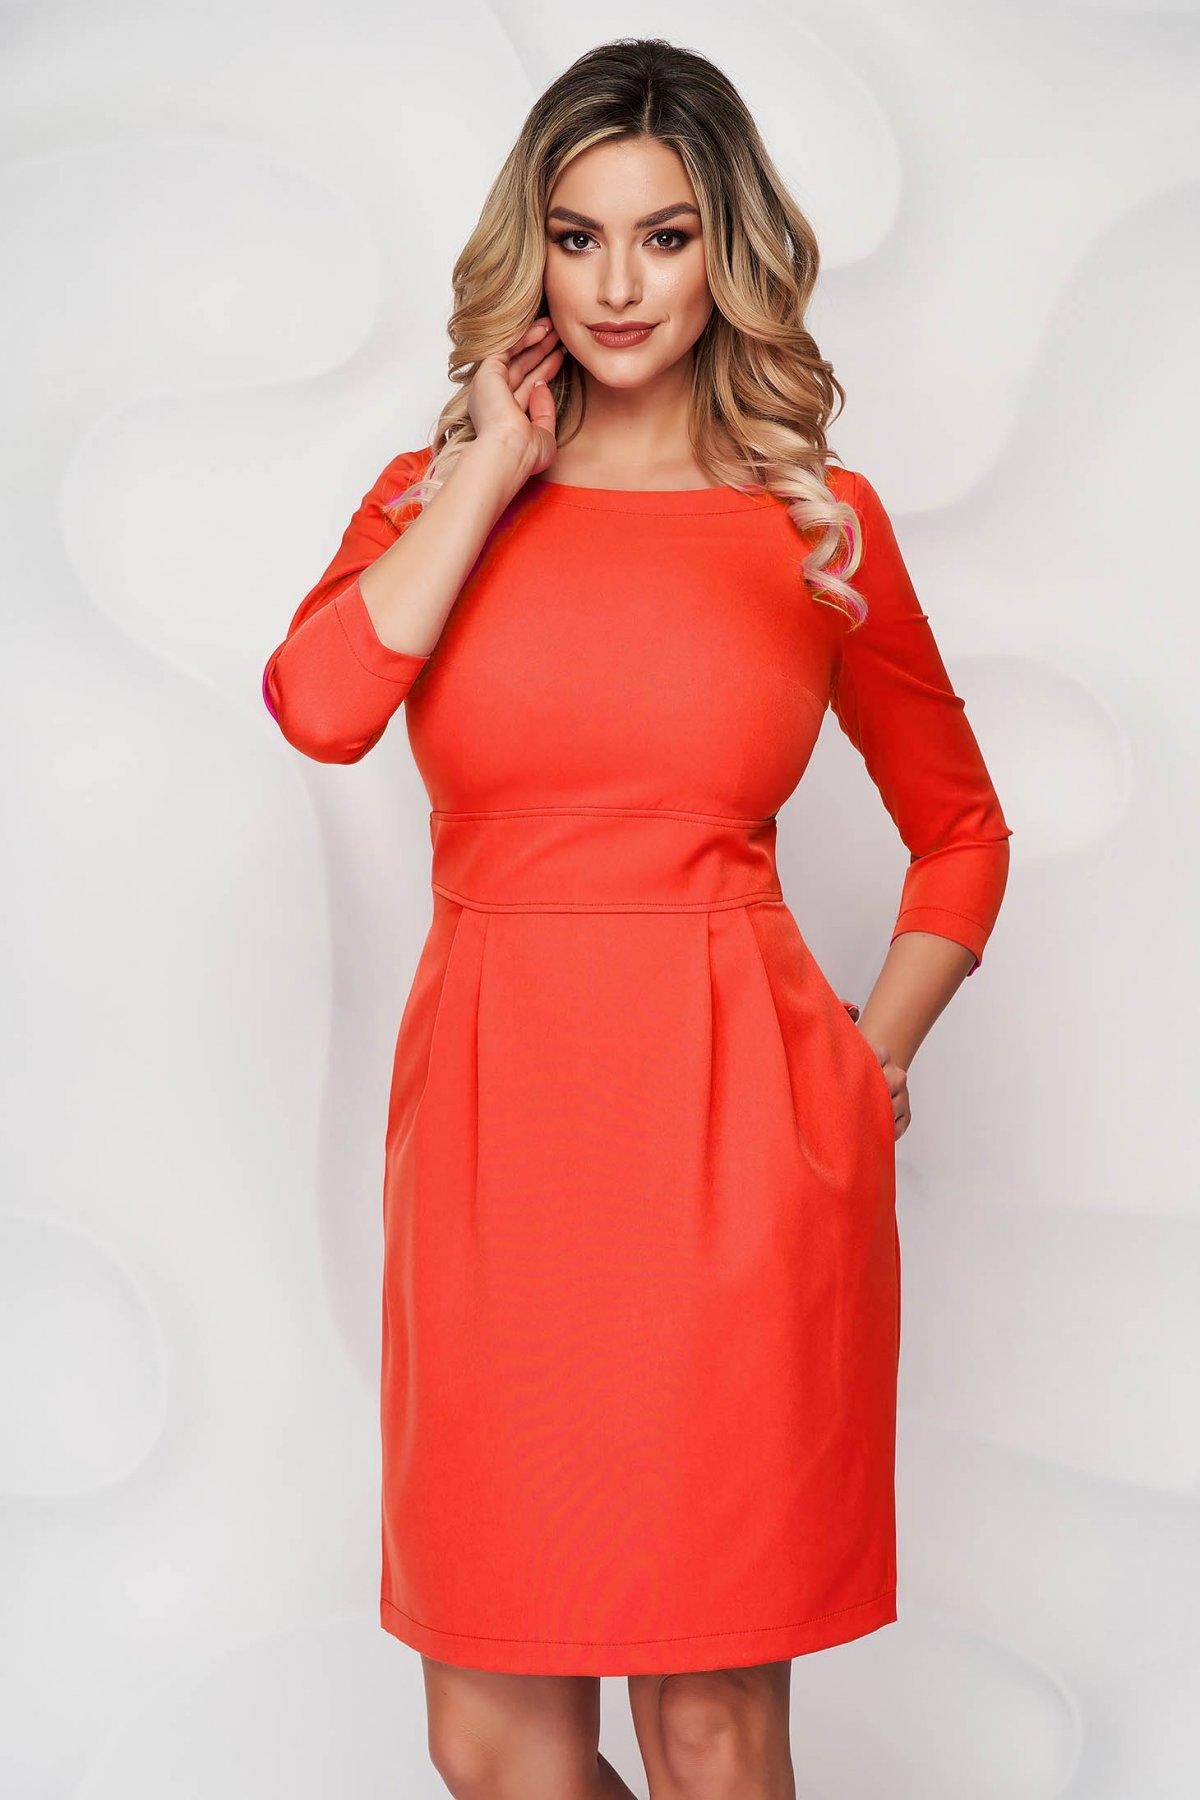 Rochie StarShinerS portocalie scurta din stofa usor elastica cu croi in a si buzunare - medelin.ro